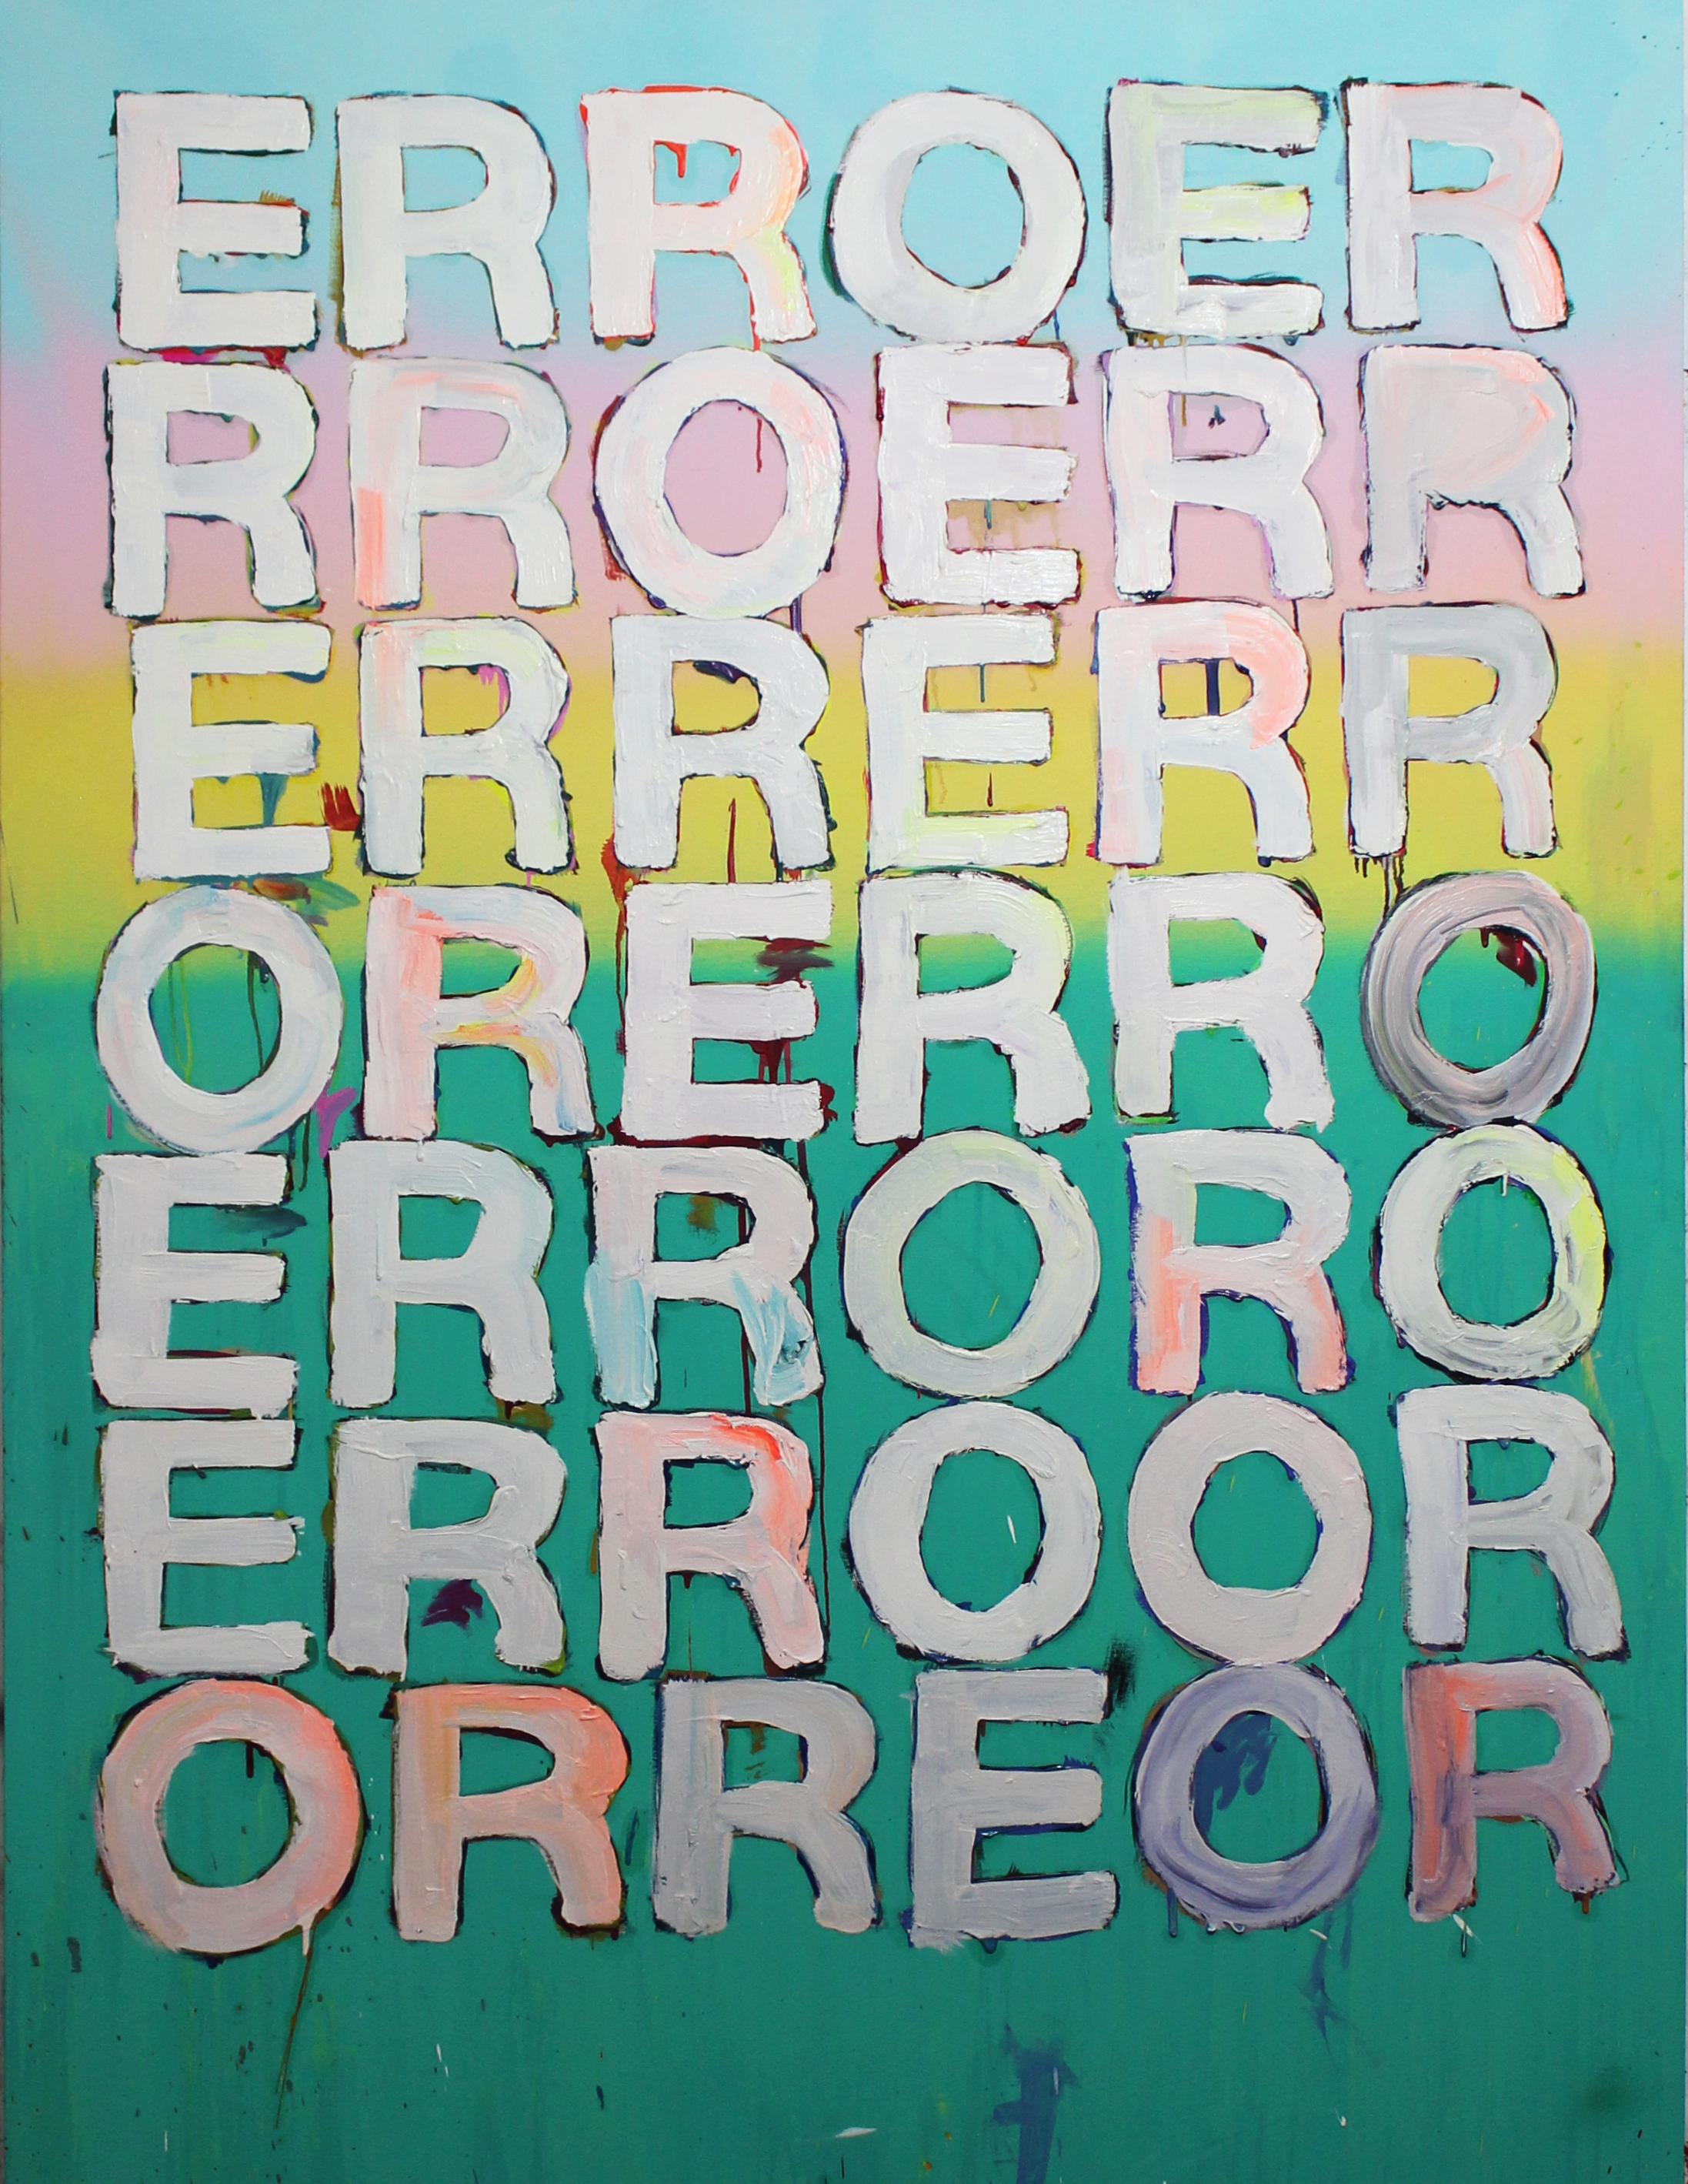 A arte tipografica de Guilherme Callegari